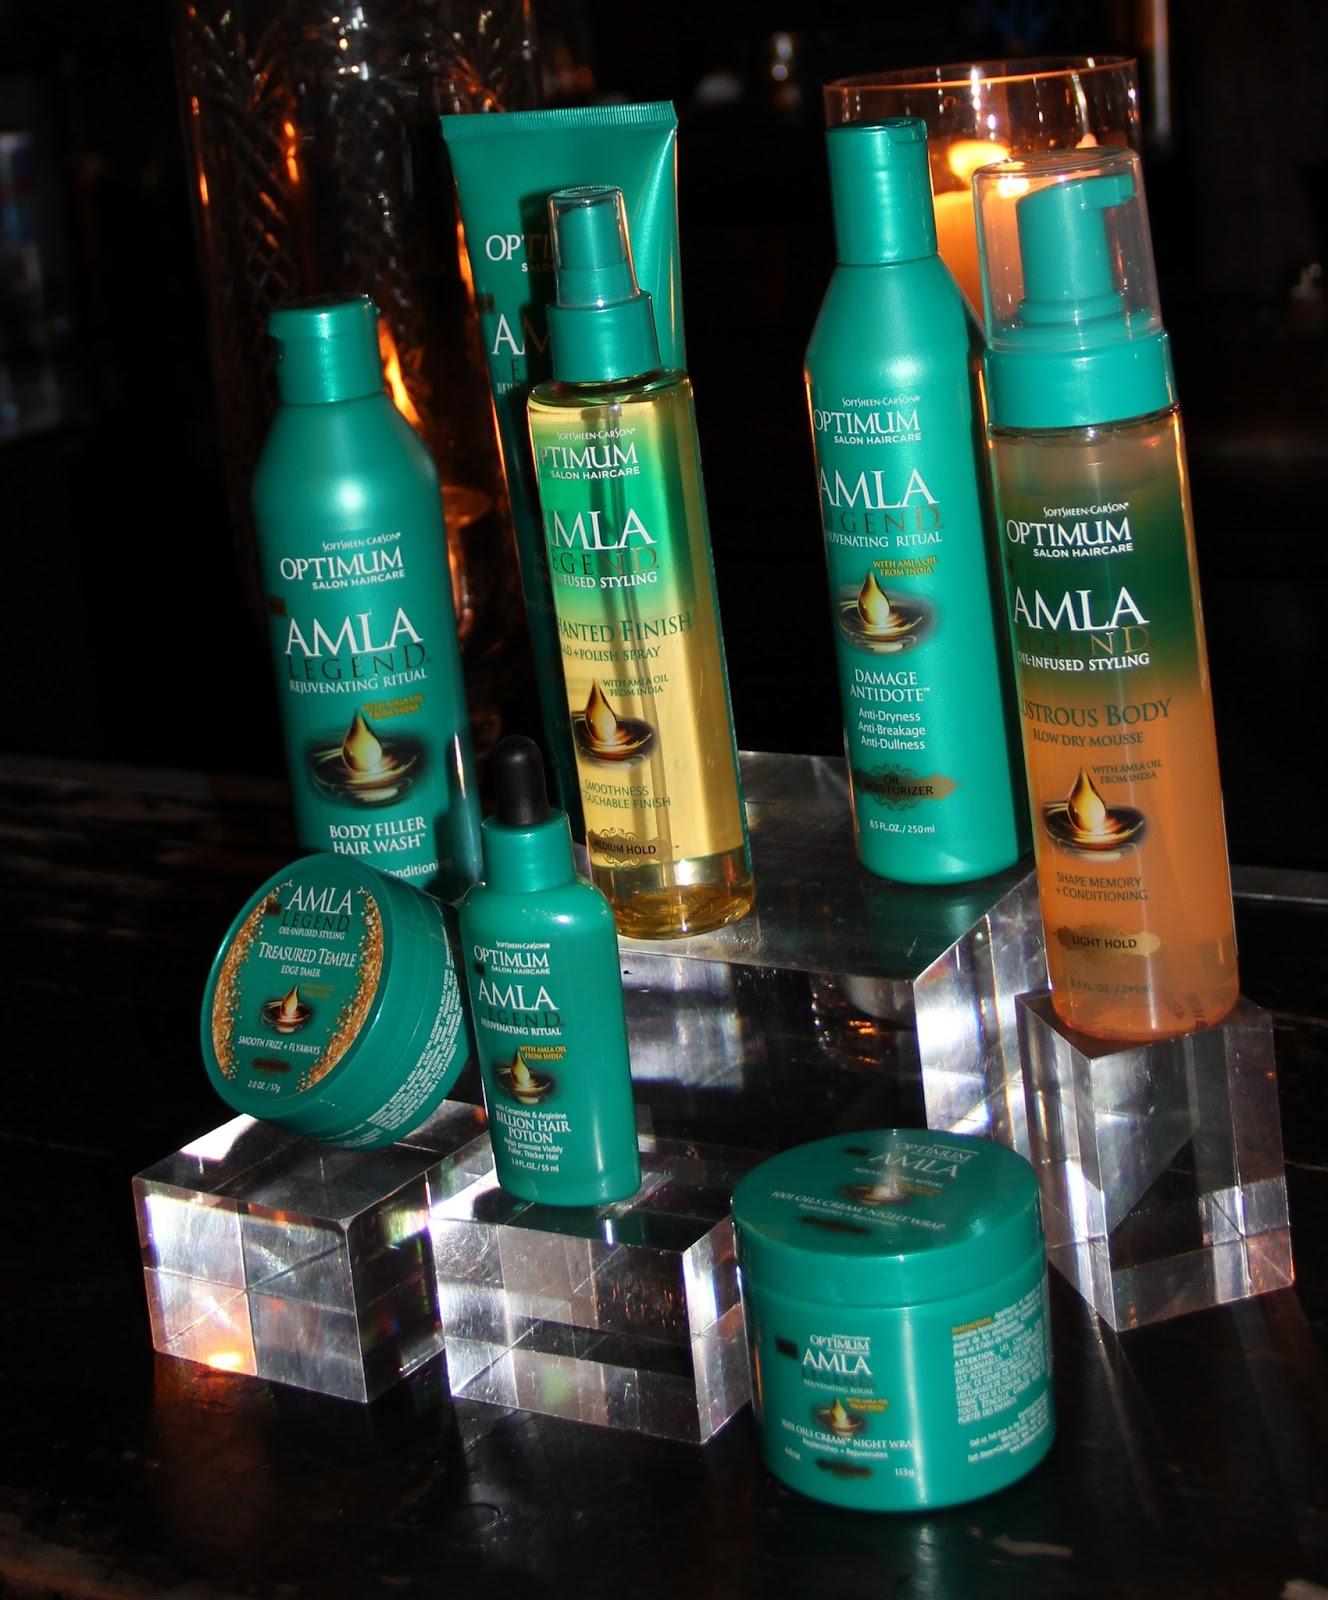 Legendary Style-Optimum® Salon Care AMLA LEGEND STYLING